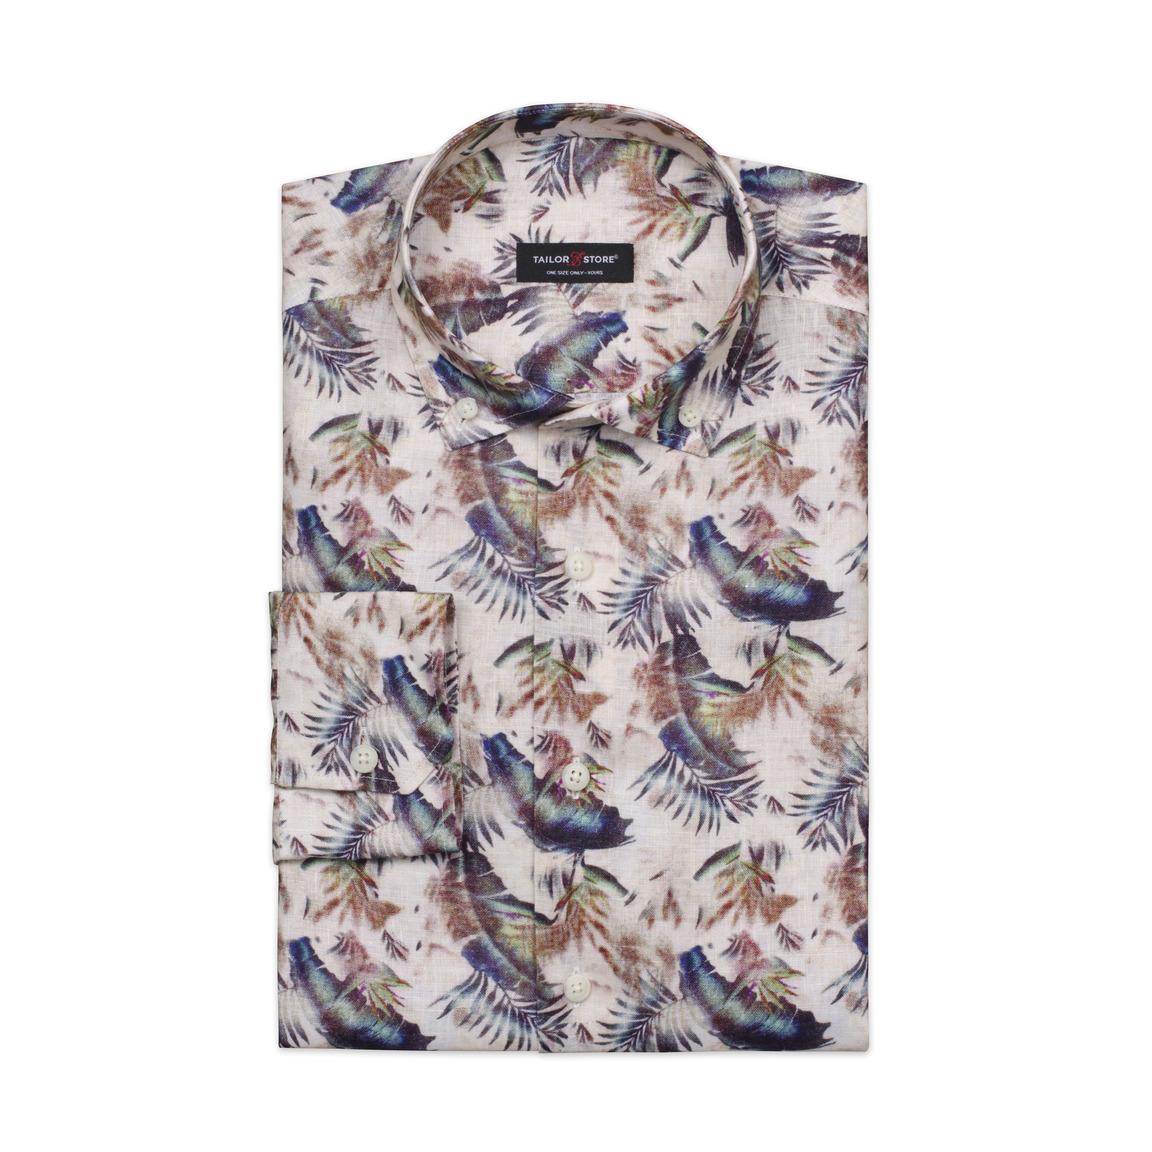 Limited Edition, Leinenhemd mit Federn